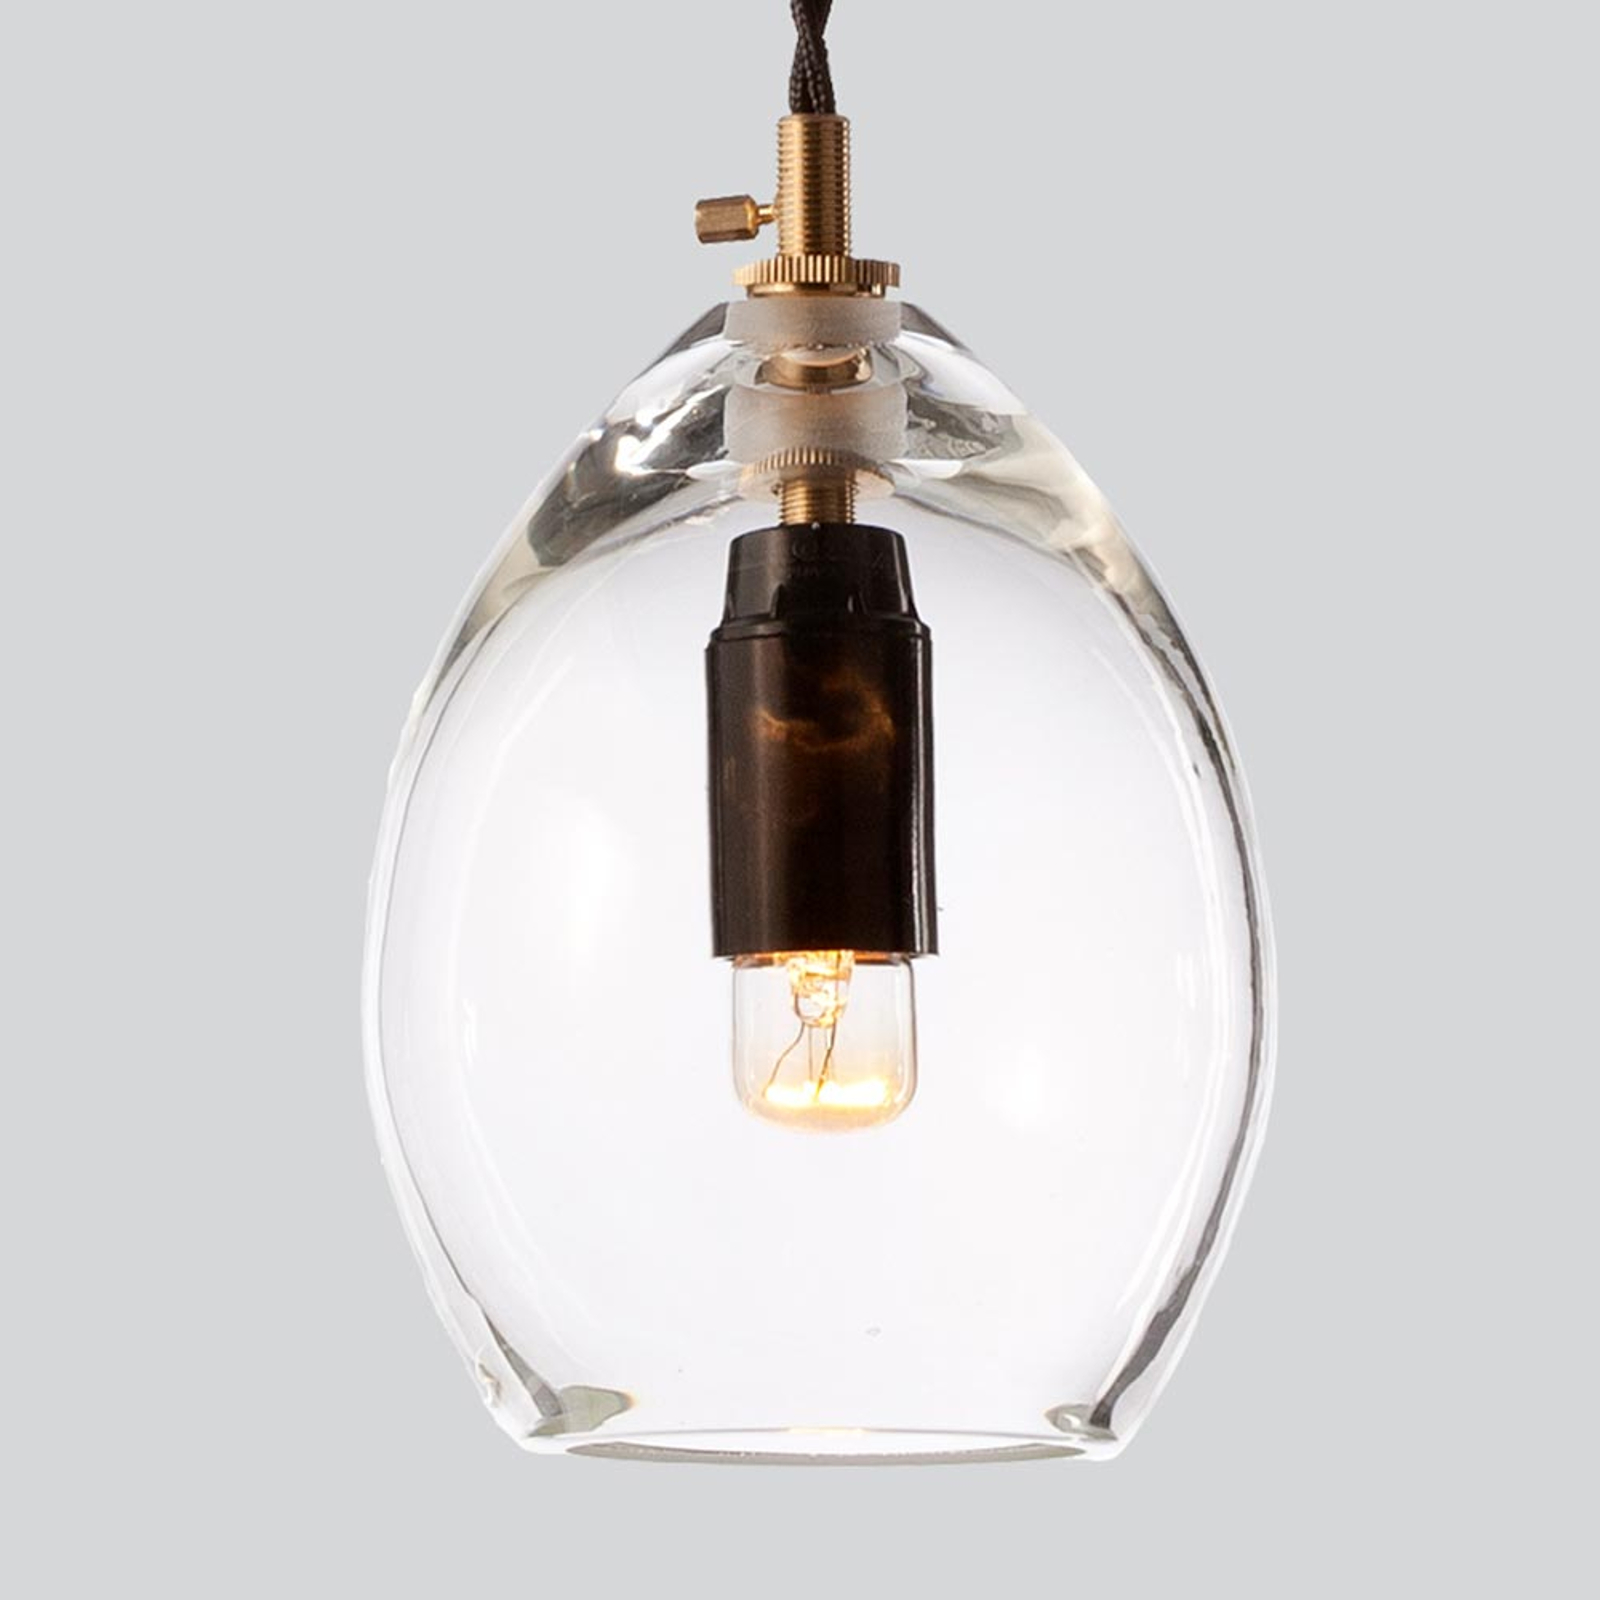 Northern Unika - design-hanglamp, 10,5 cm